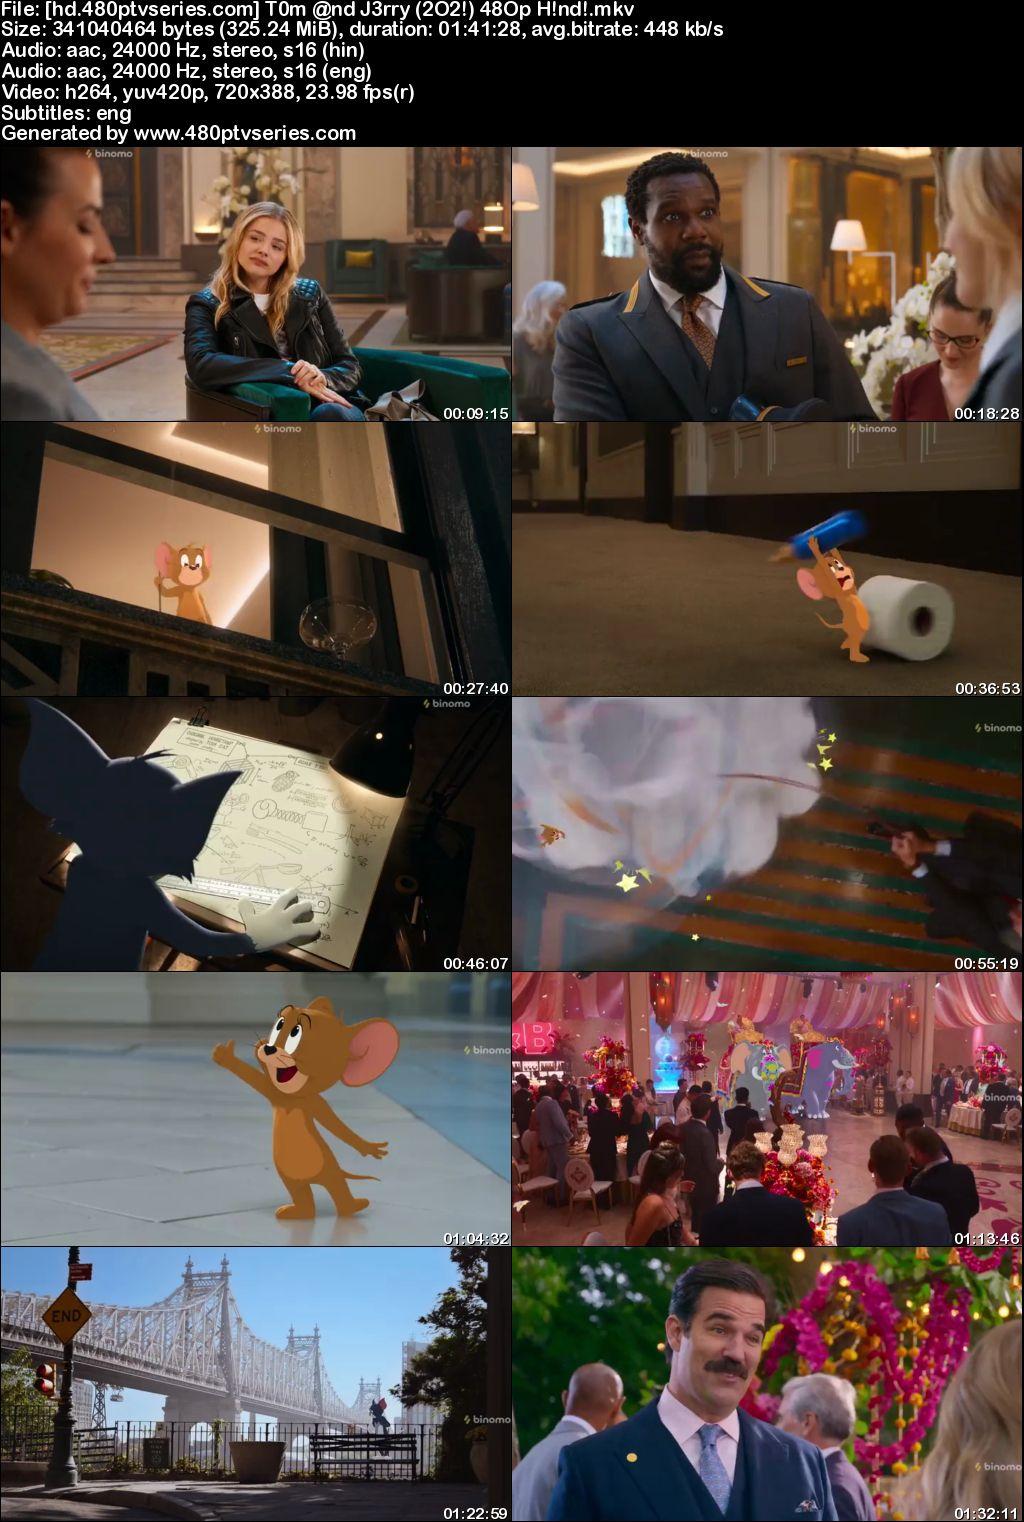 Tom and Jerry (2021) 300MB Full Hindi Dual Audio Movie Download 480p WebRip Free Watch Online Full Movie Download Worldfree4u 9xmovies